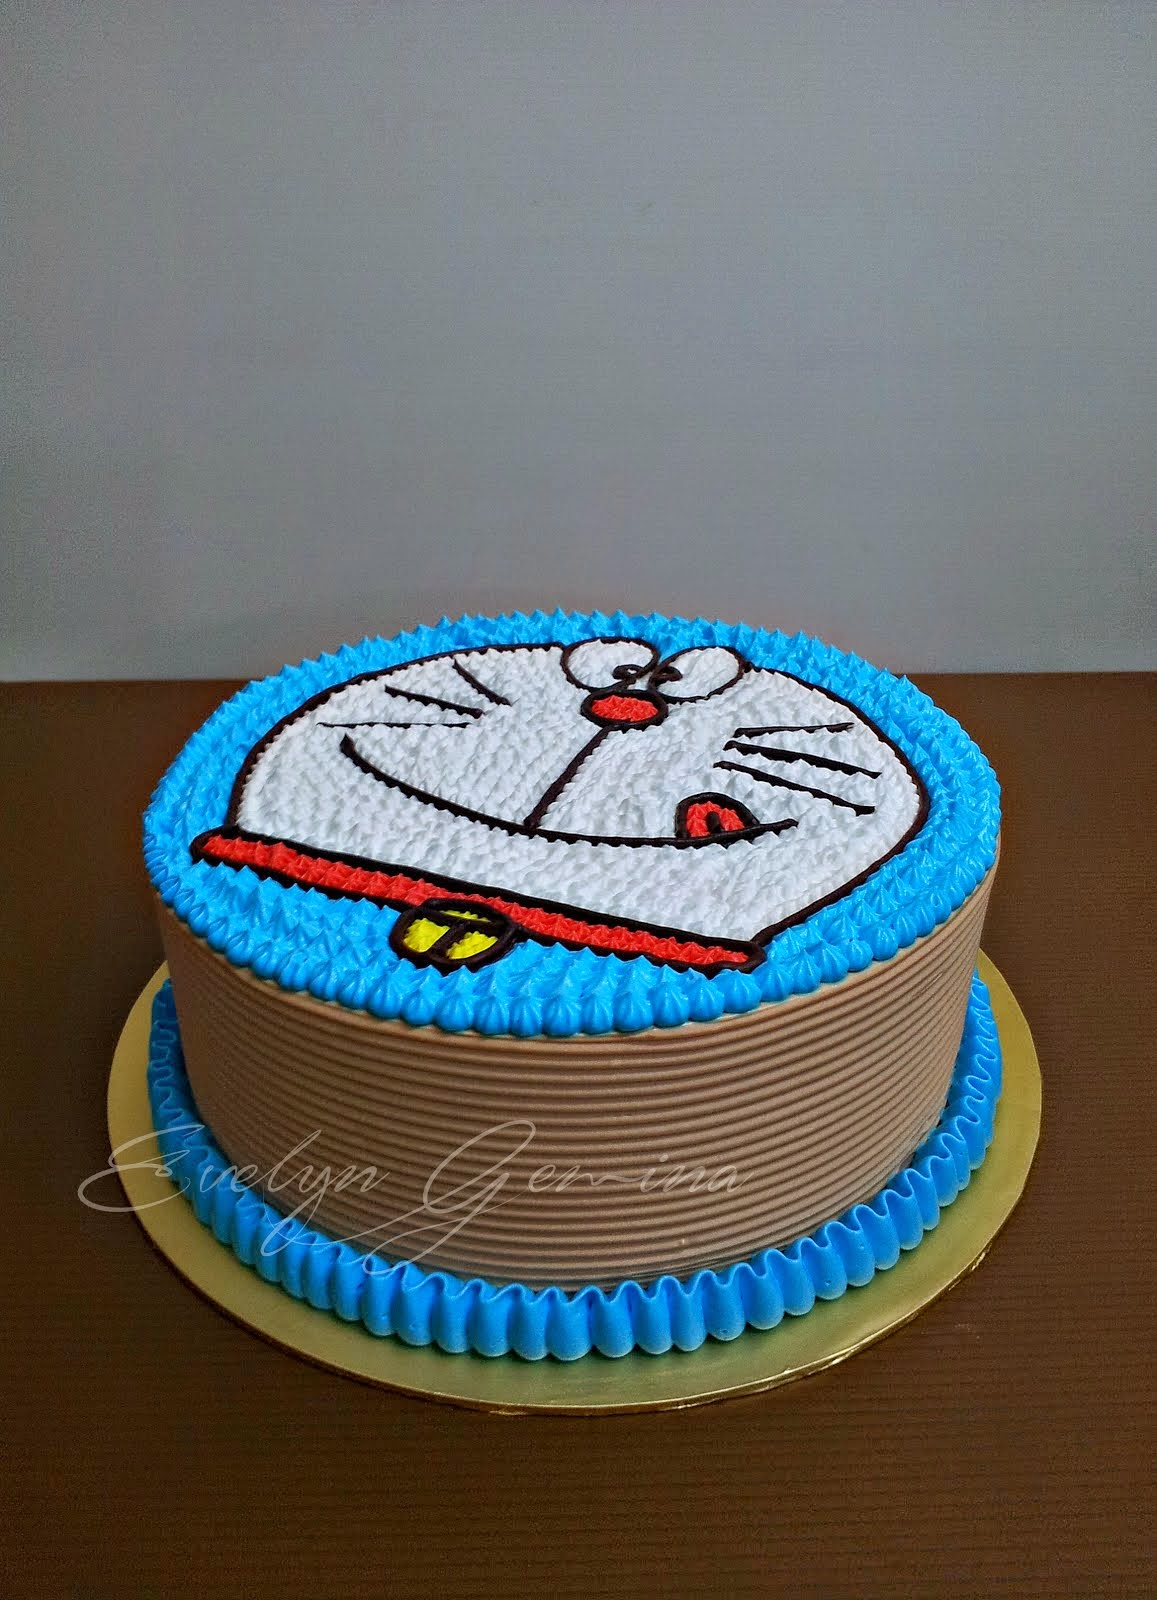 Doraemon Cake (Chocolate spongecake) / 2KG